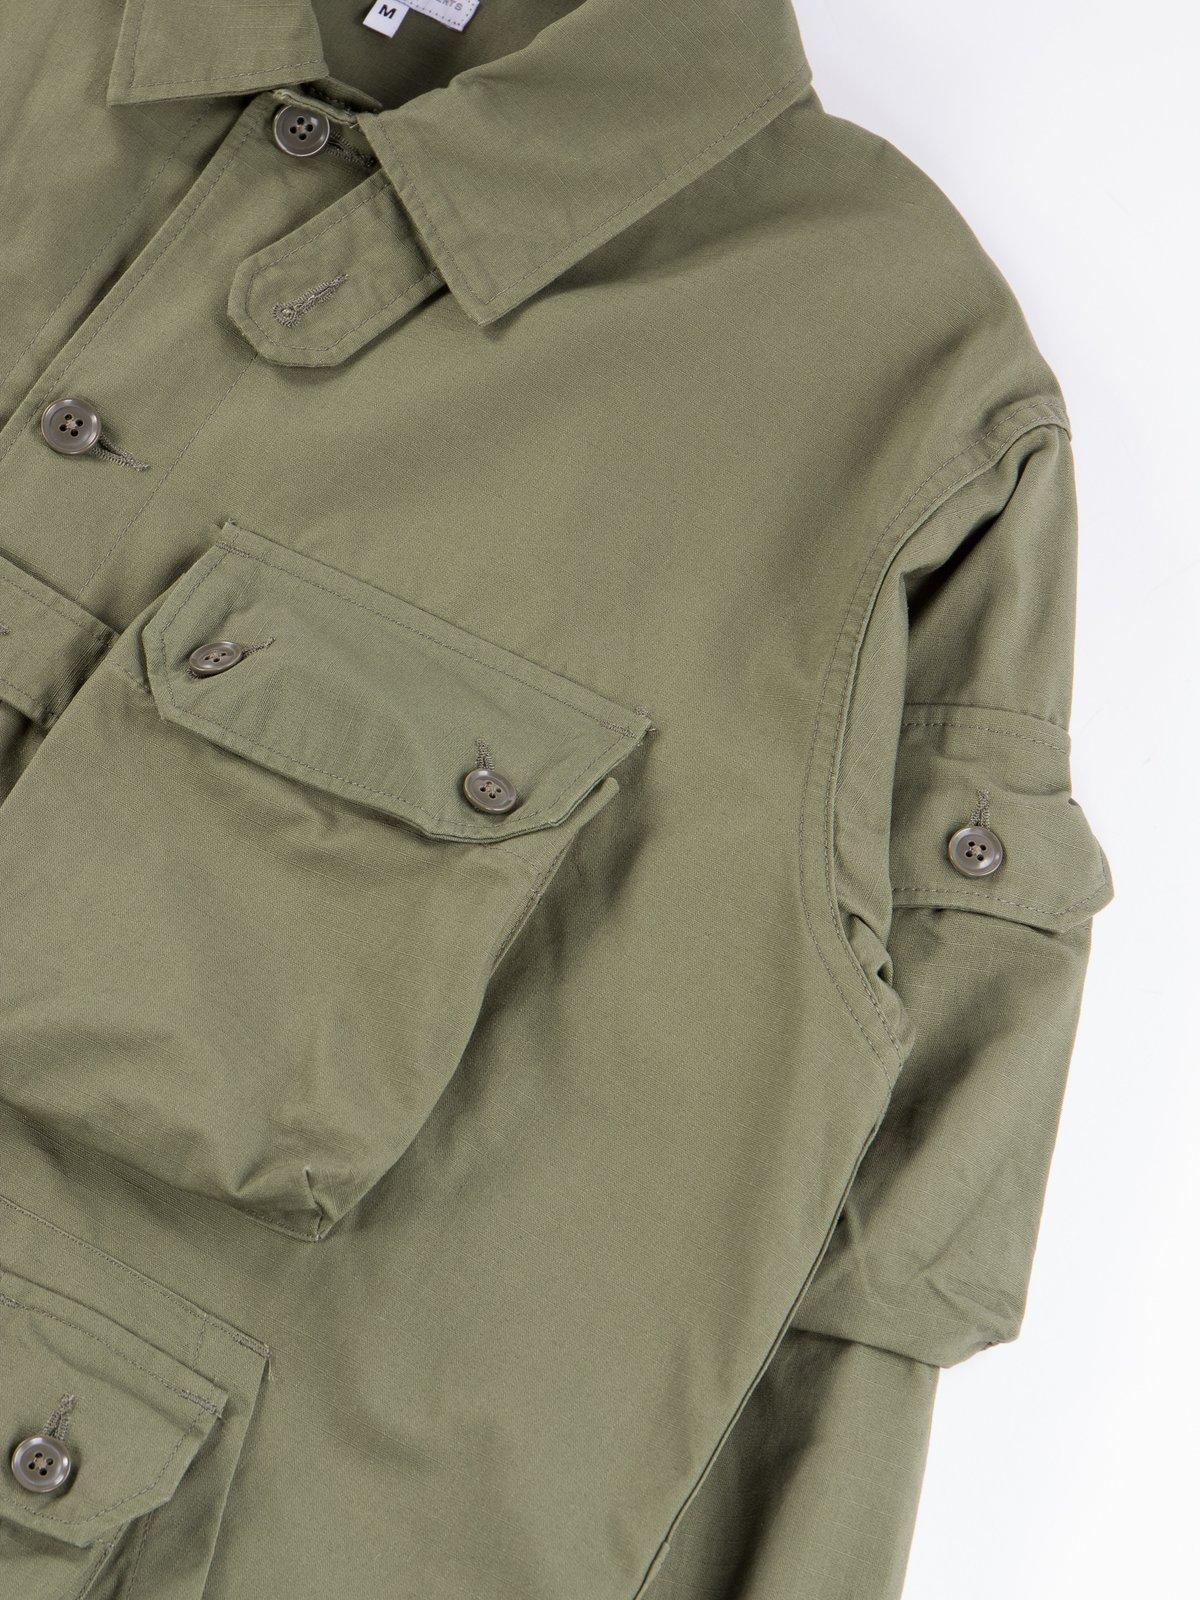 Olive Cotton Ripstop Explorer Shirt Jacket - Image 5